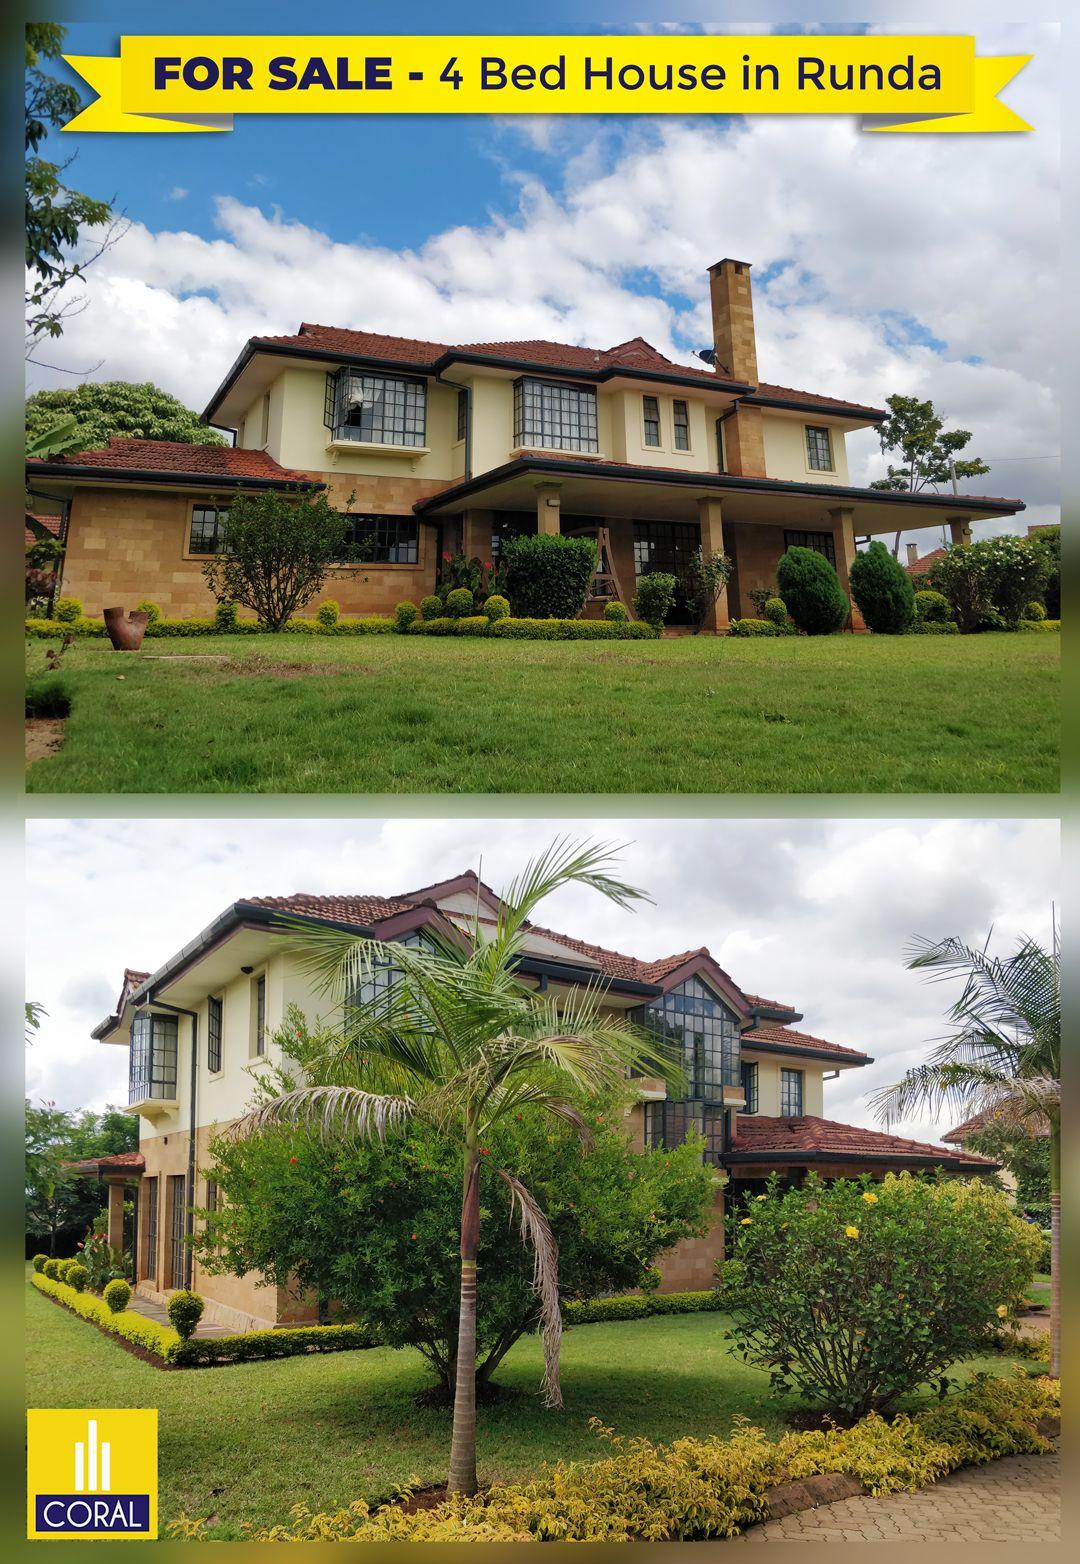 4 Bedroom House For Sale In Runda Mae Ridge 4 Bedroom House